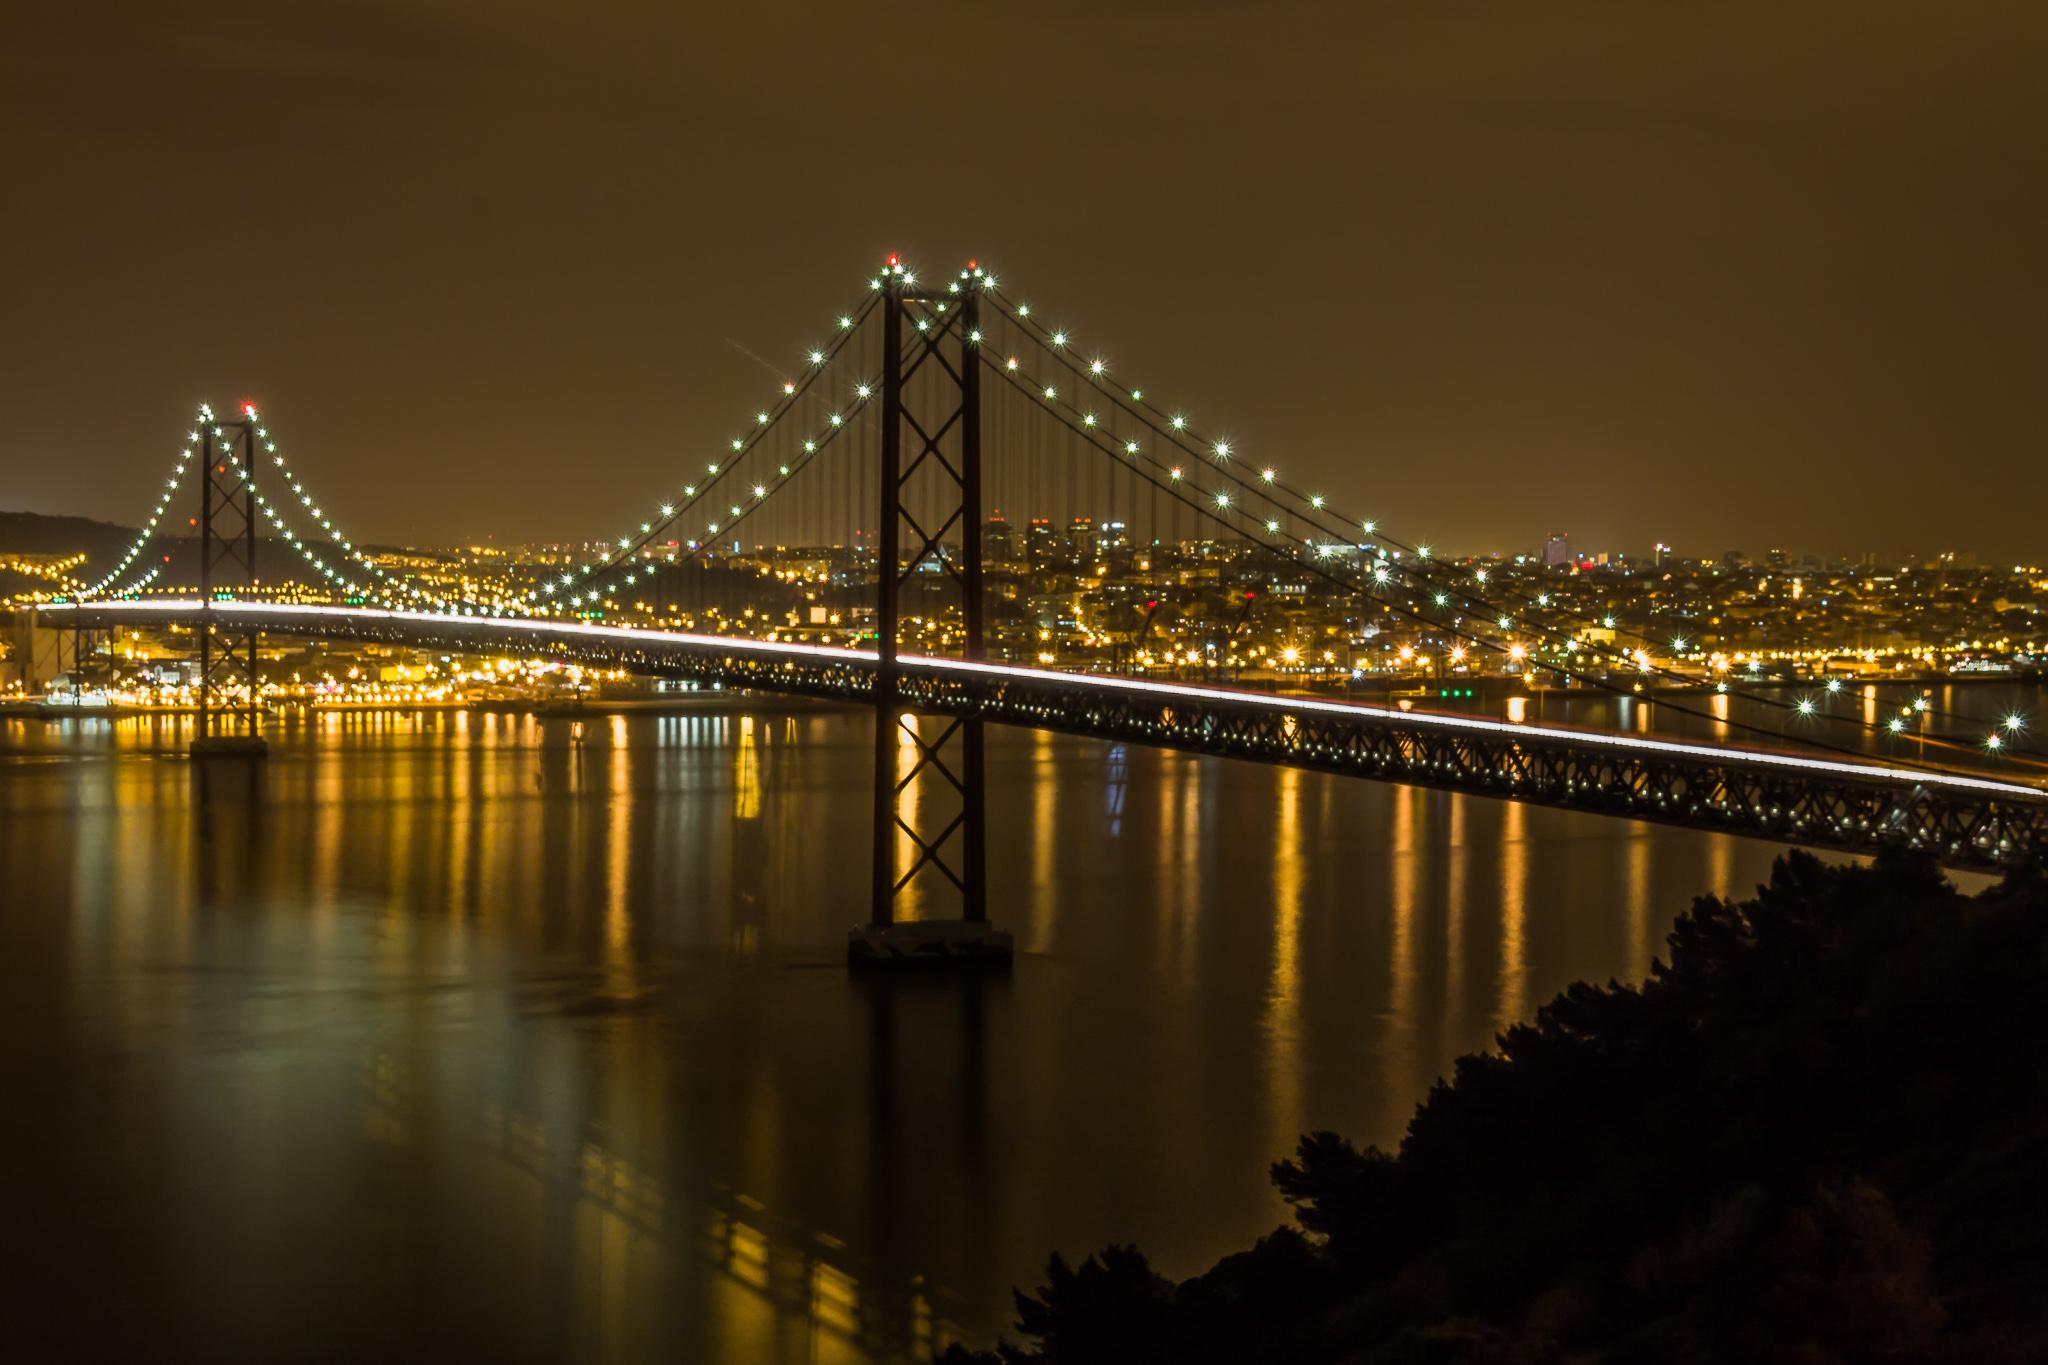 25th Of April Bridge, Portugal